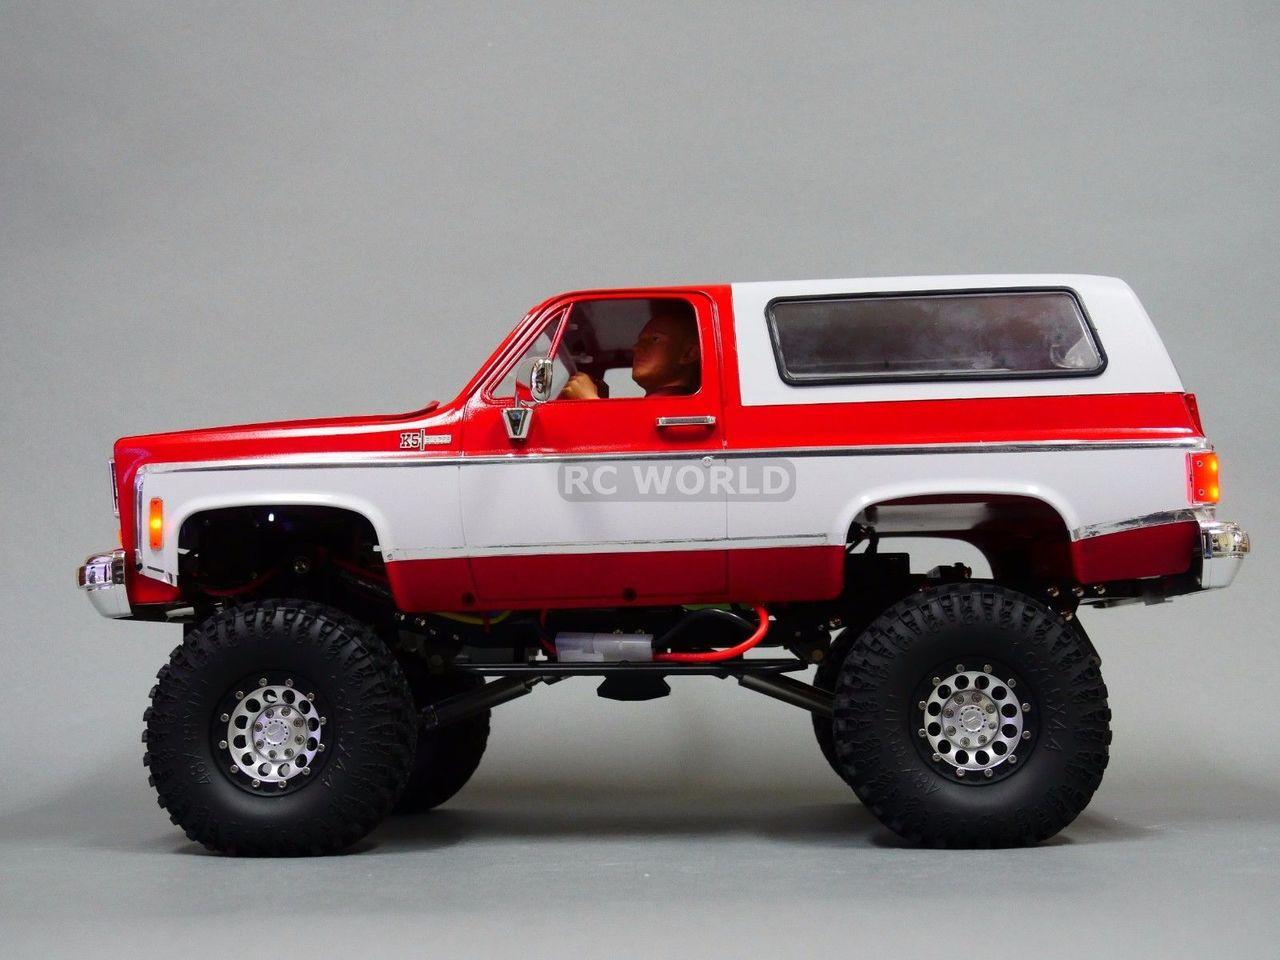 1 10 Rc Custom All Metal Chevy Blazer K5 Rc Truck 2 Speed 4wd Engine Sounds Rc World